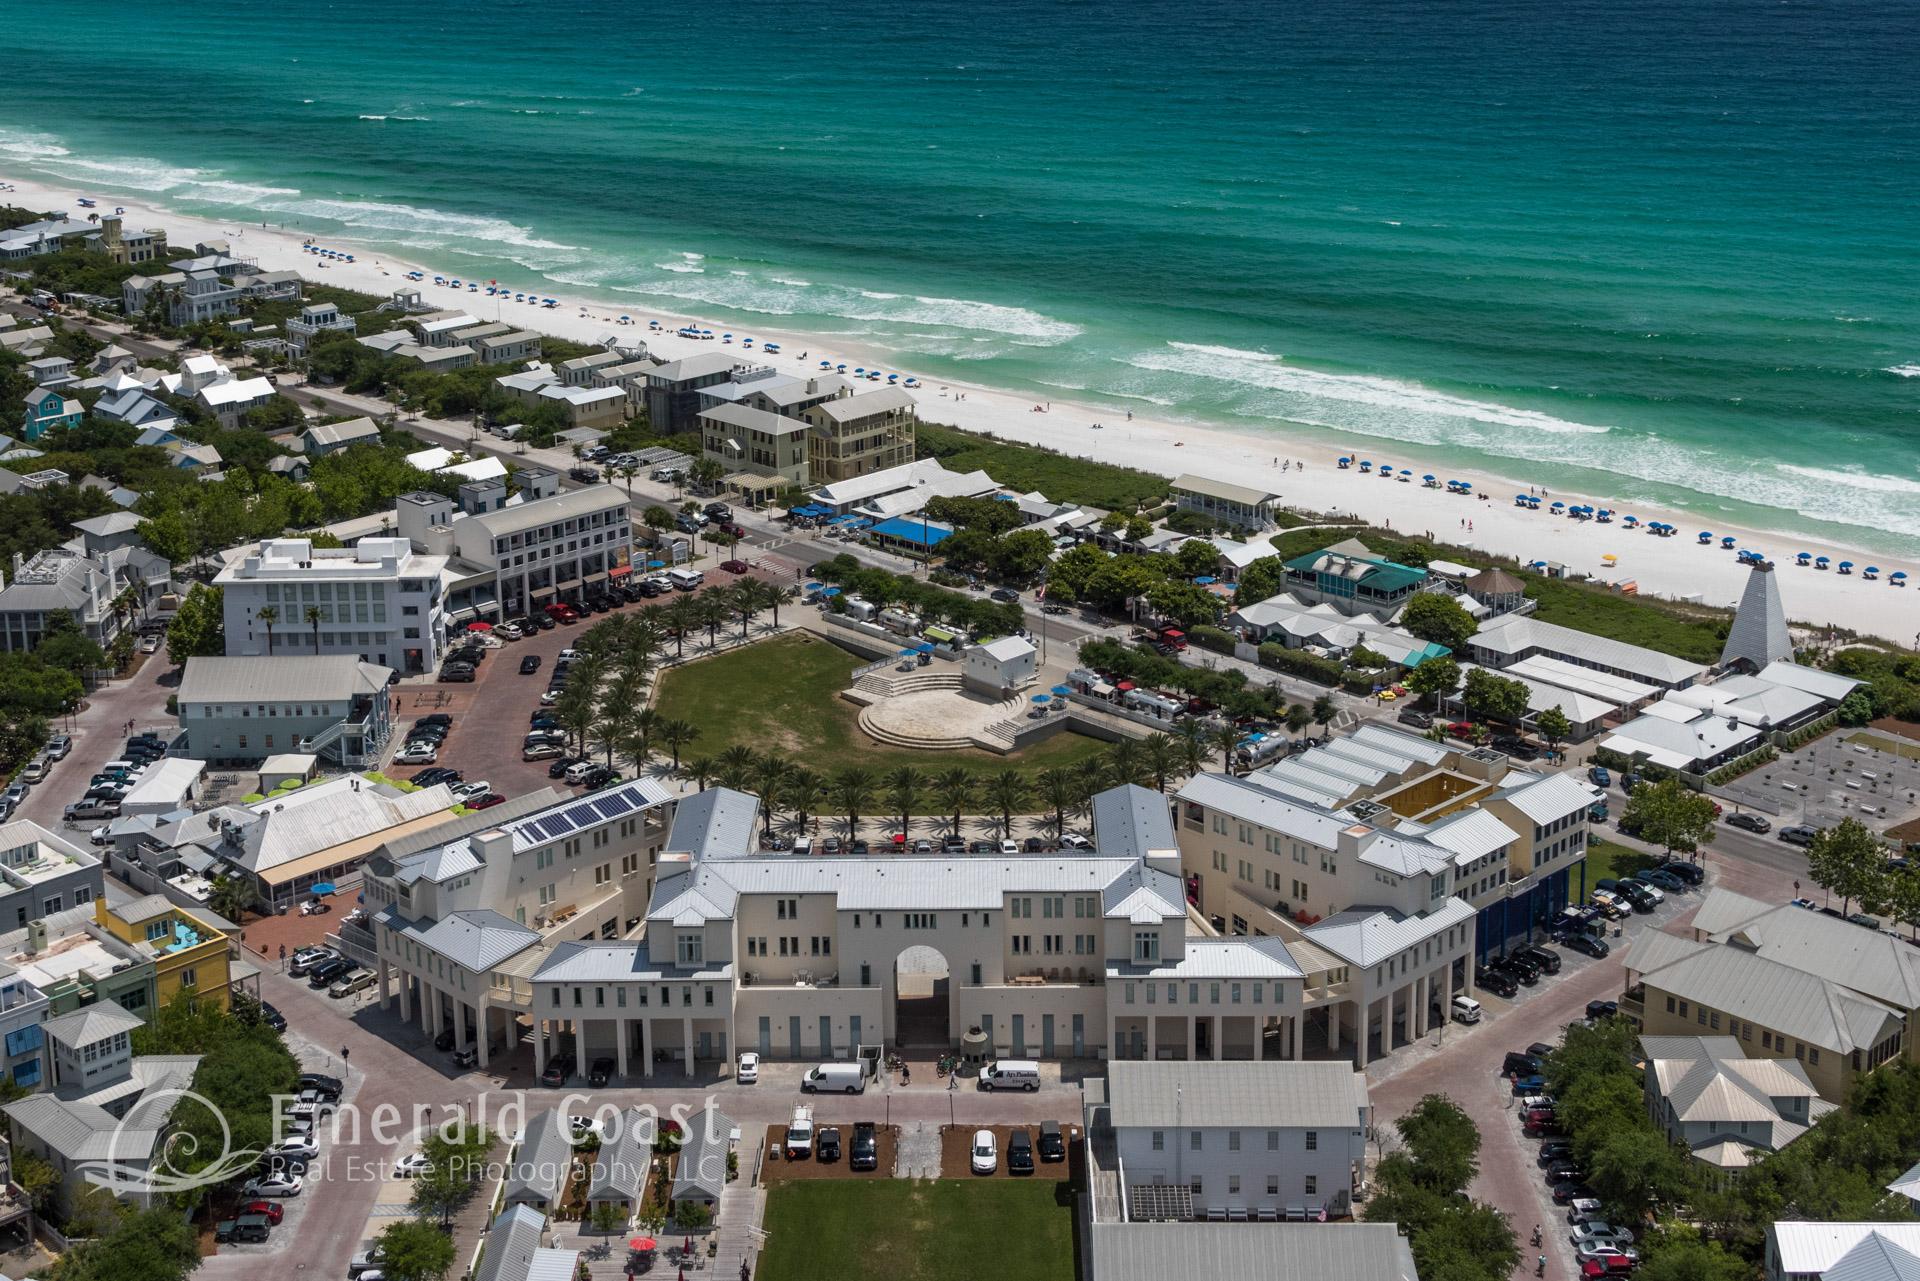 Aerial Photo of Seaside, Florida